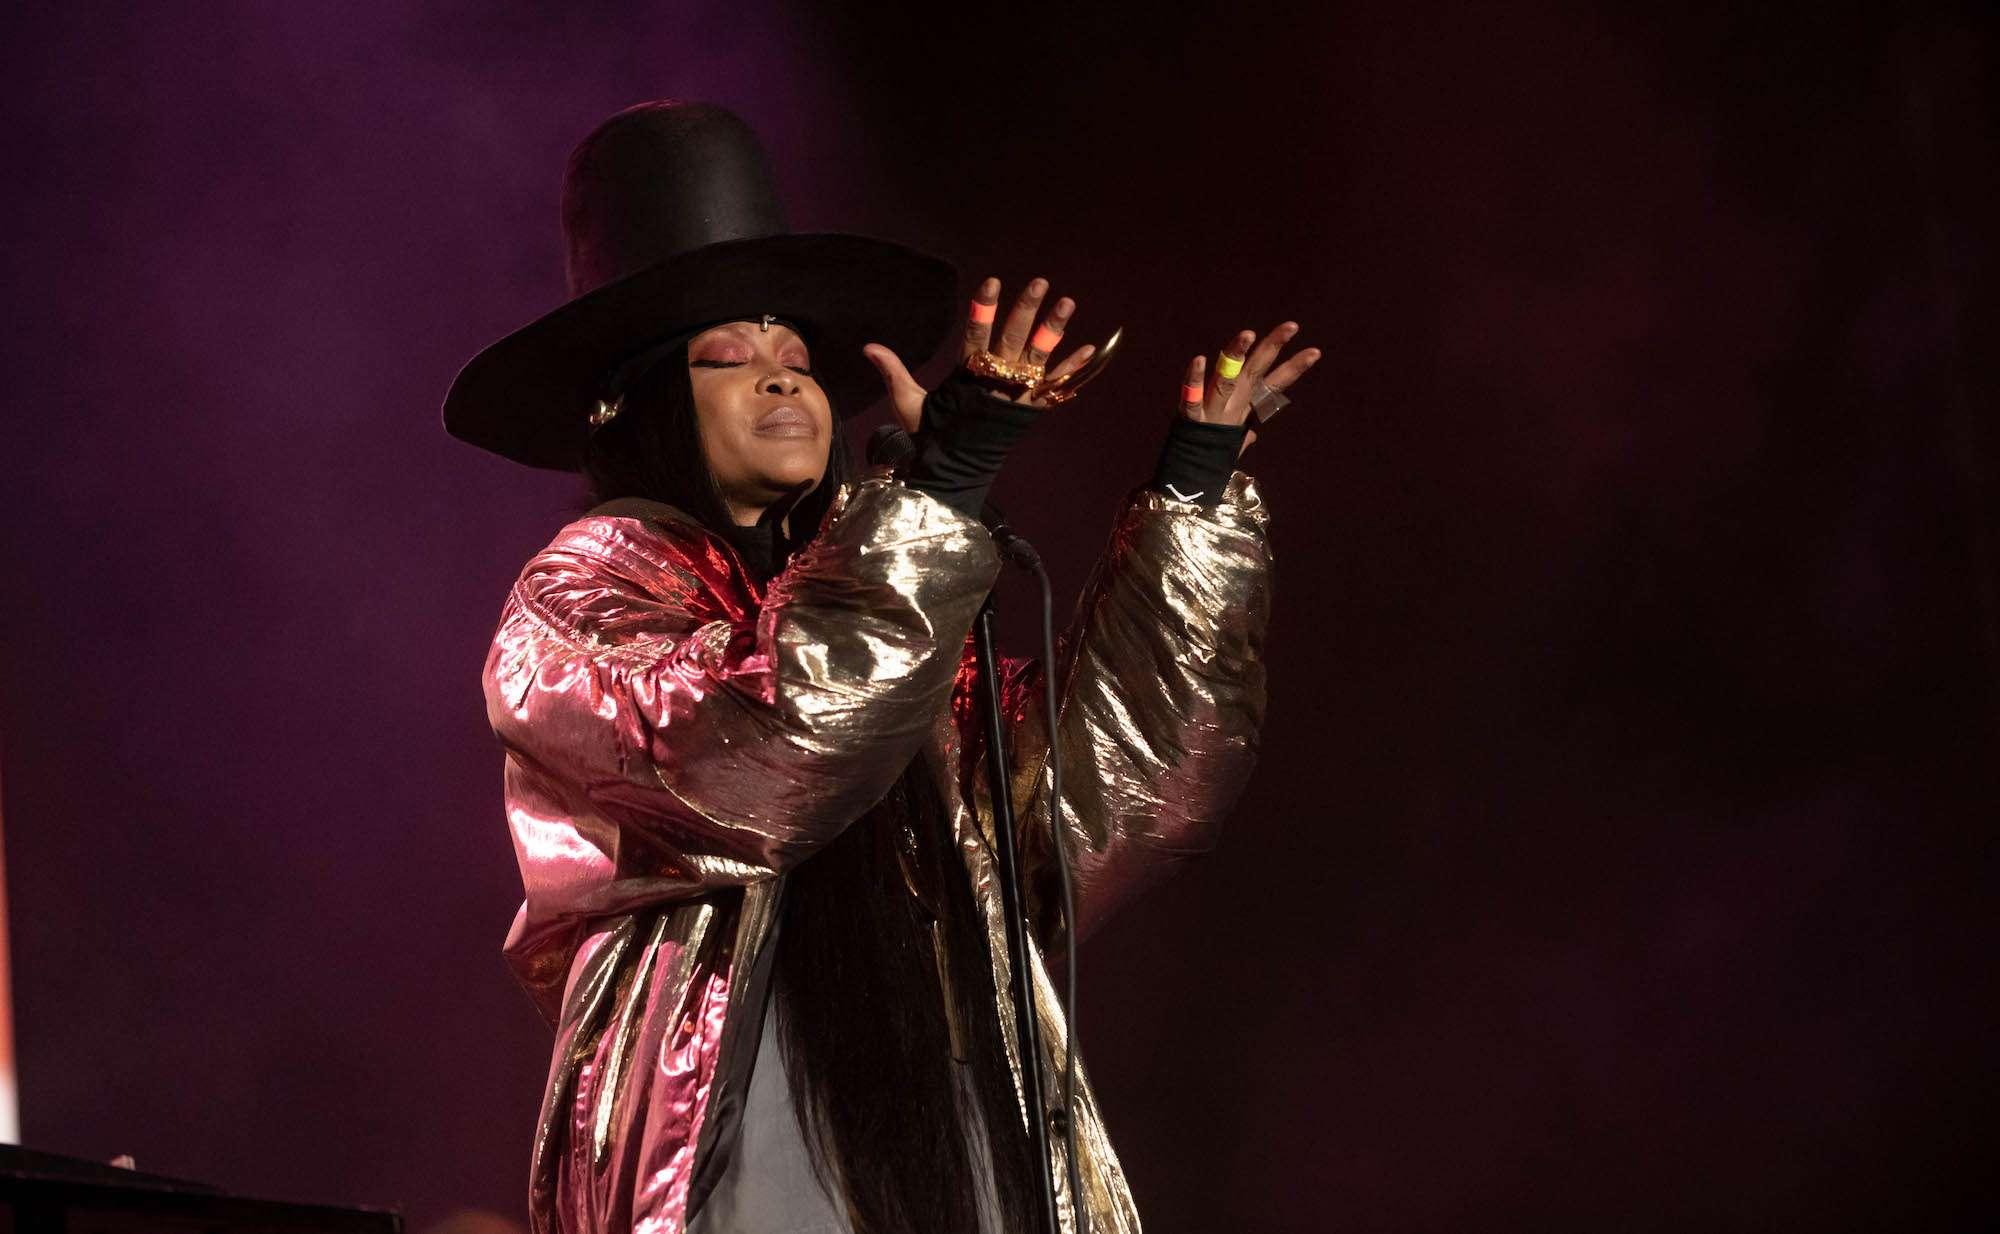 Erykah Badu Live at Pitchfork [GALLERY] 11